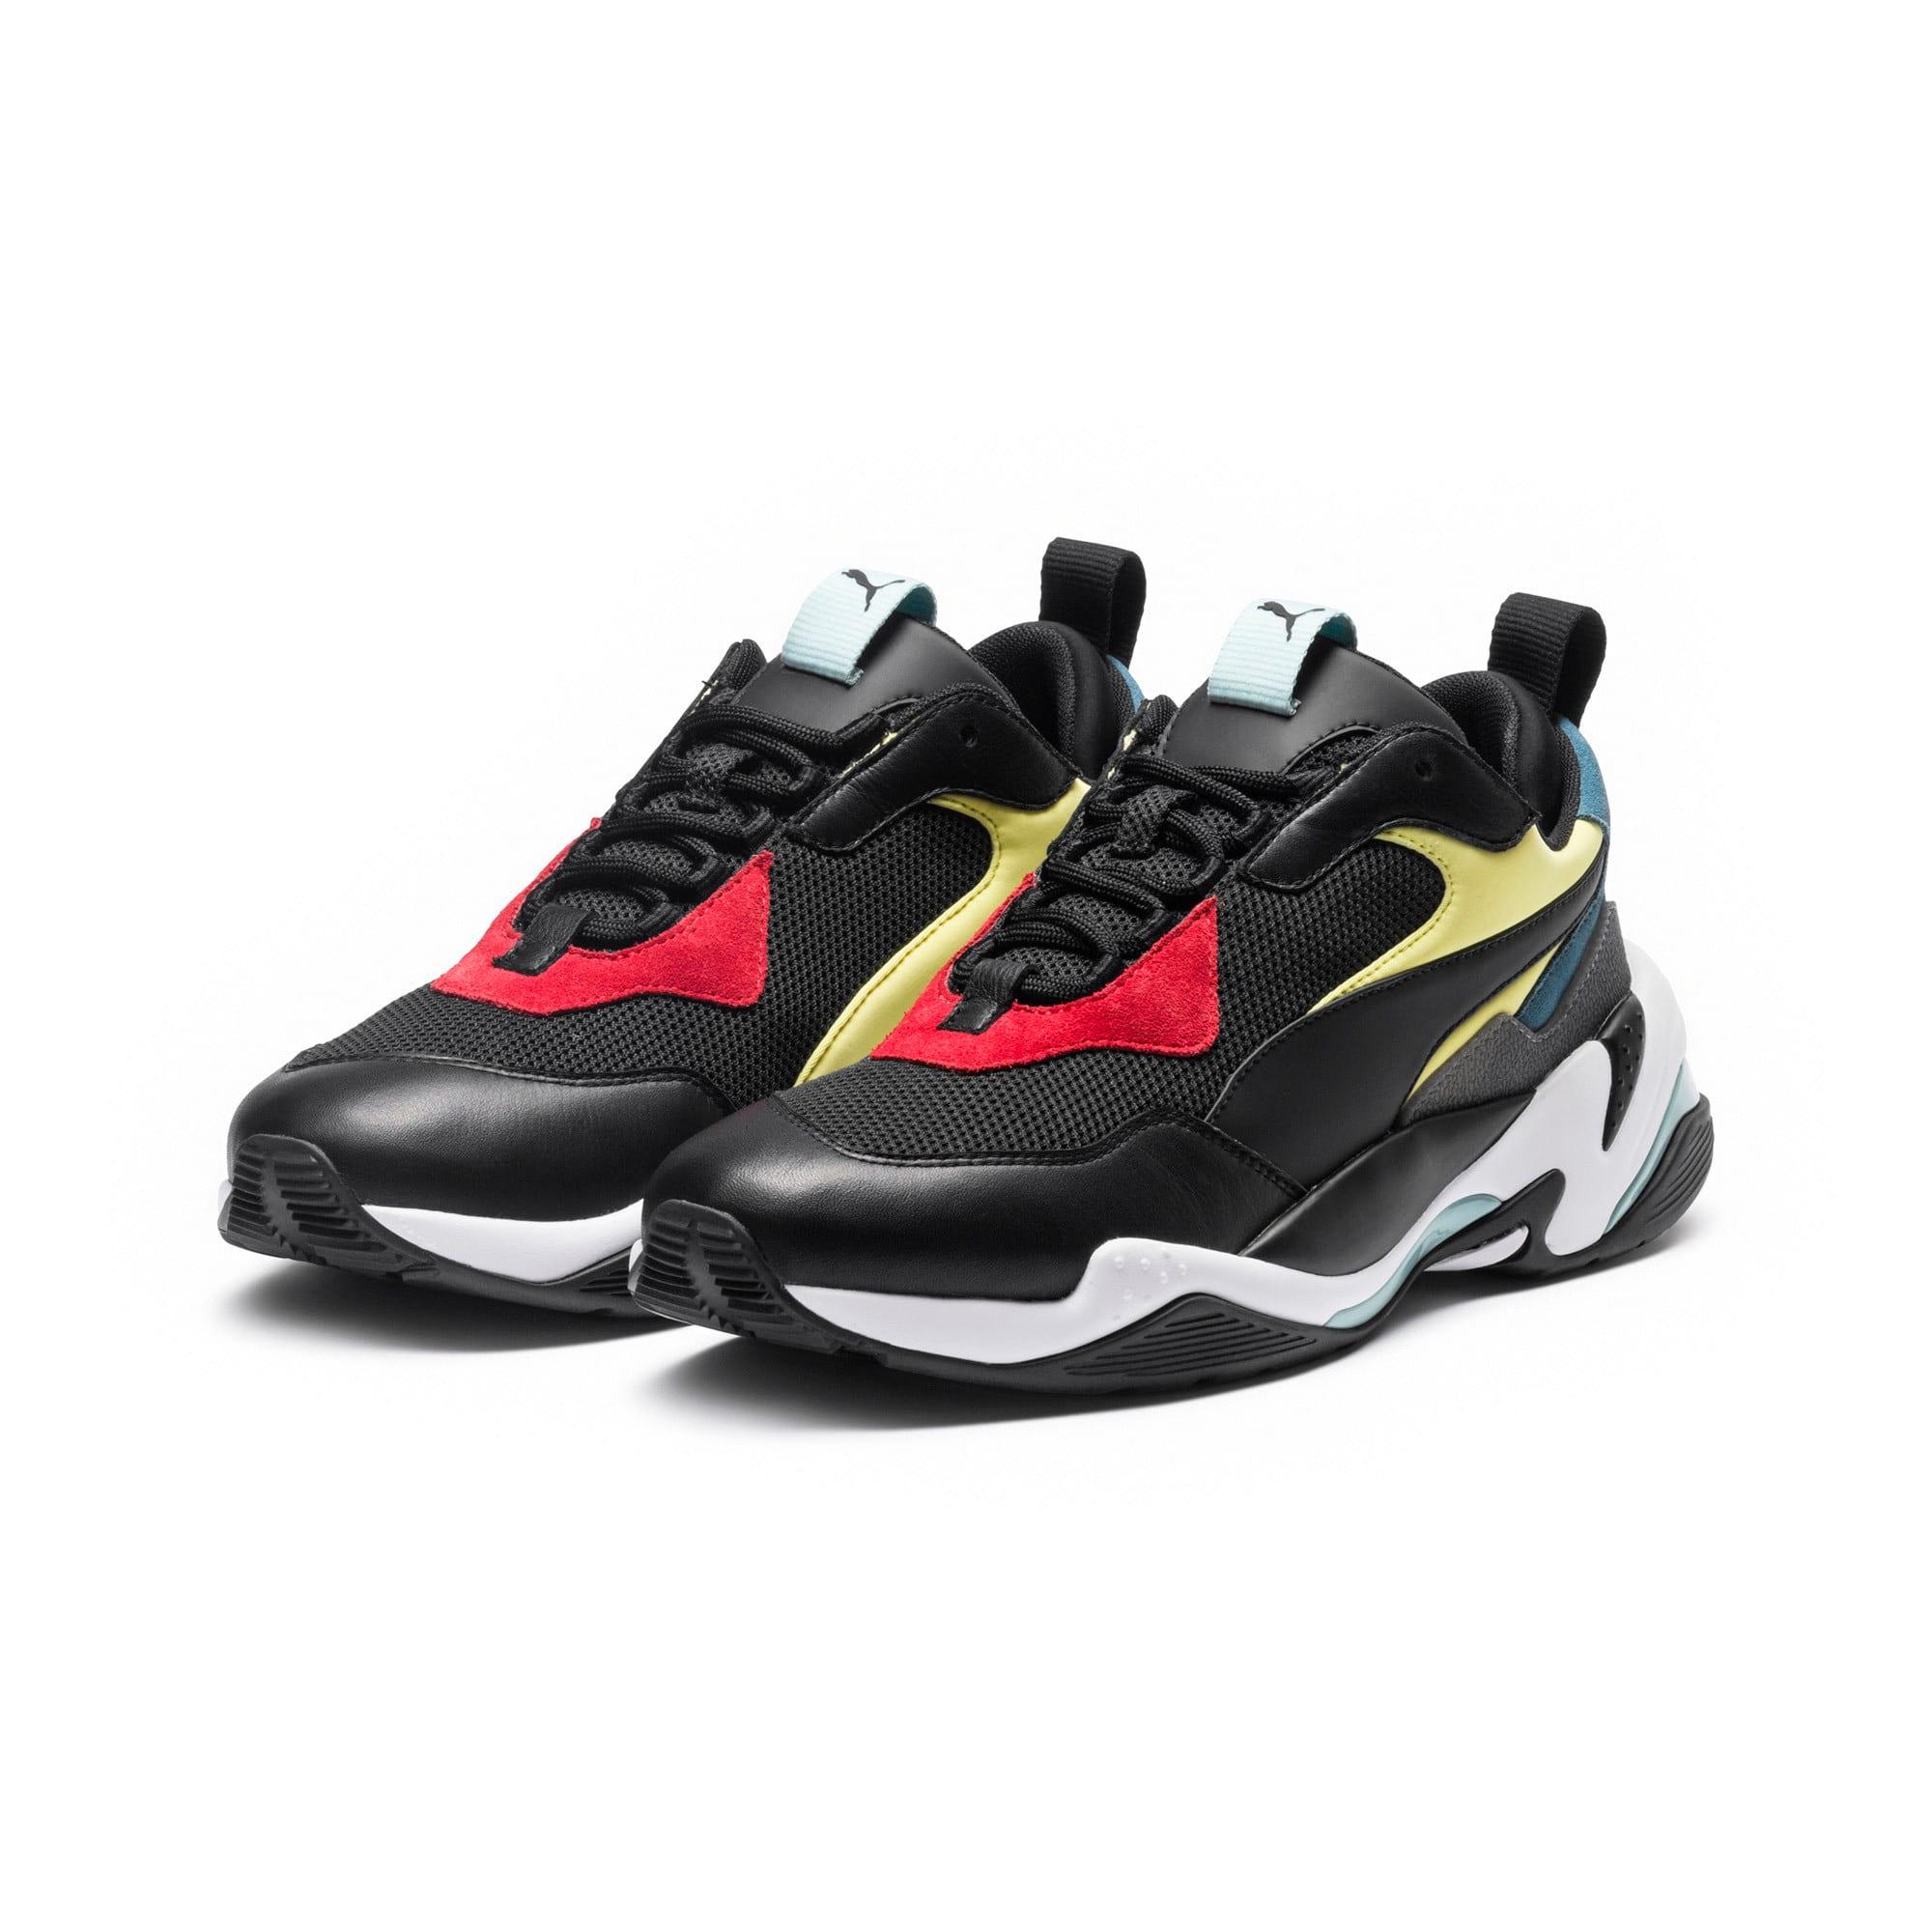 Thumbnail 2 of Thunder Spectra Sneakers, Puma Blk-Puma Blk-Puma White, medium